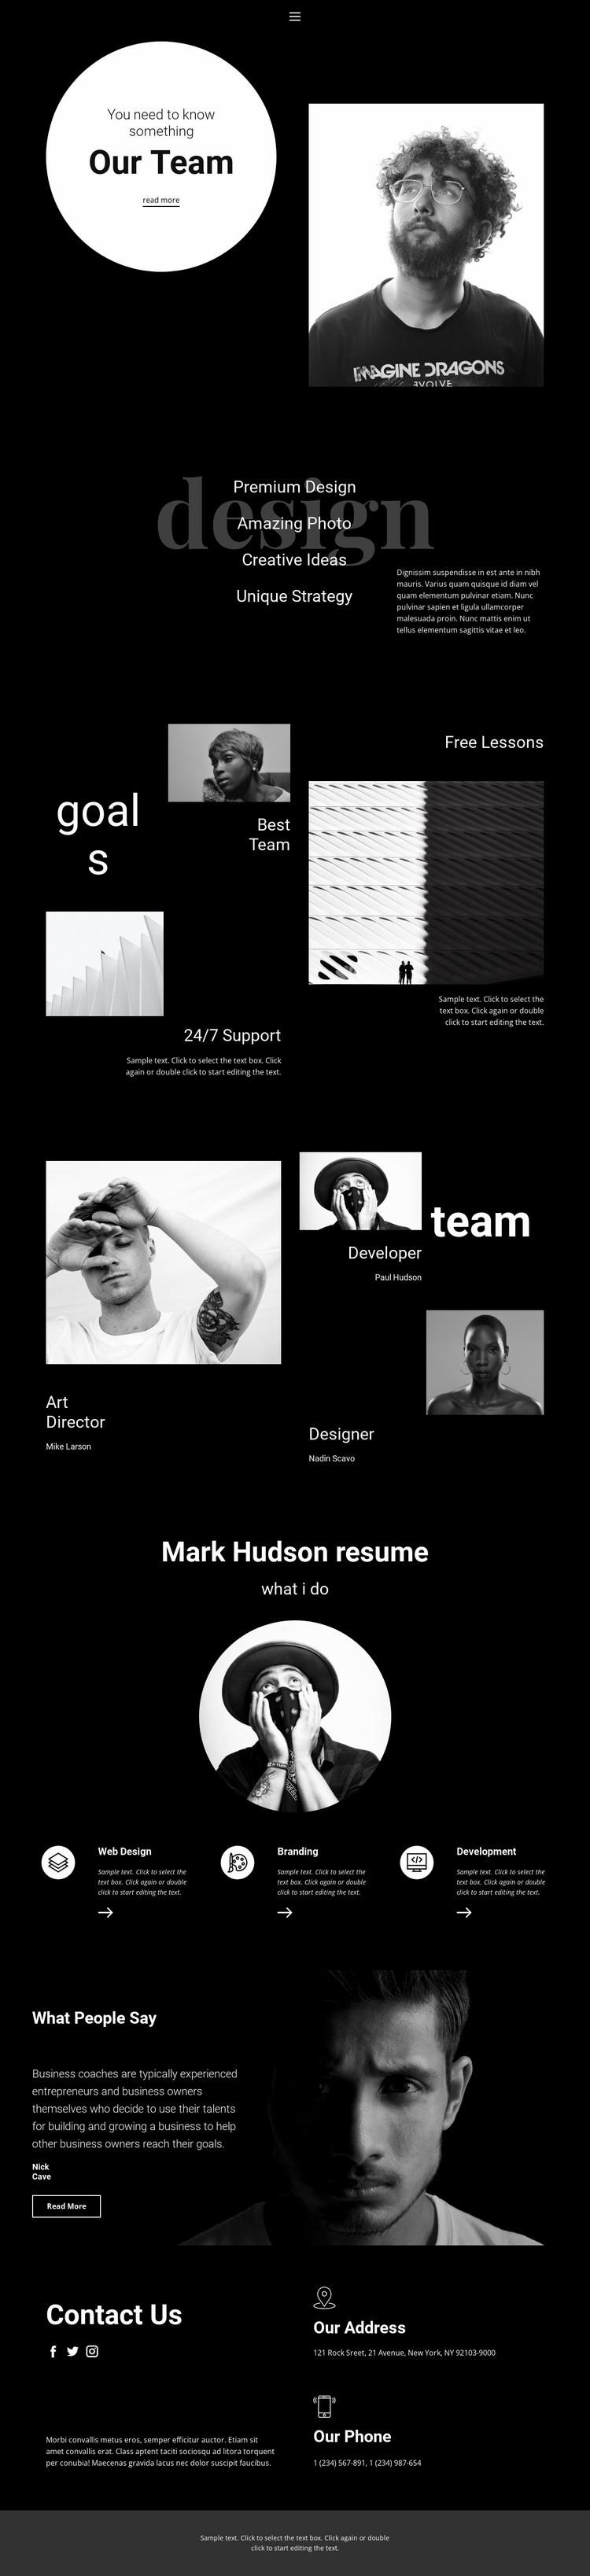 Design and development team Web Page Designer